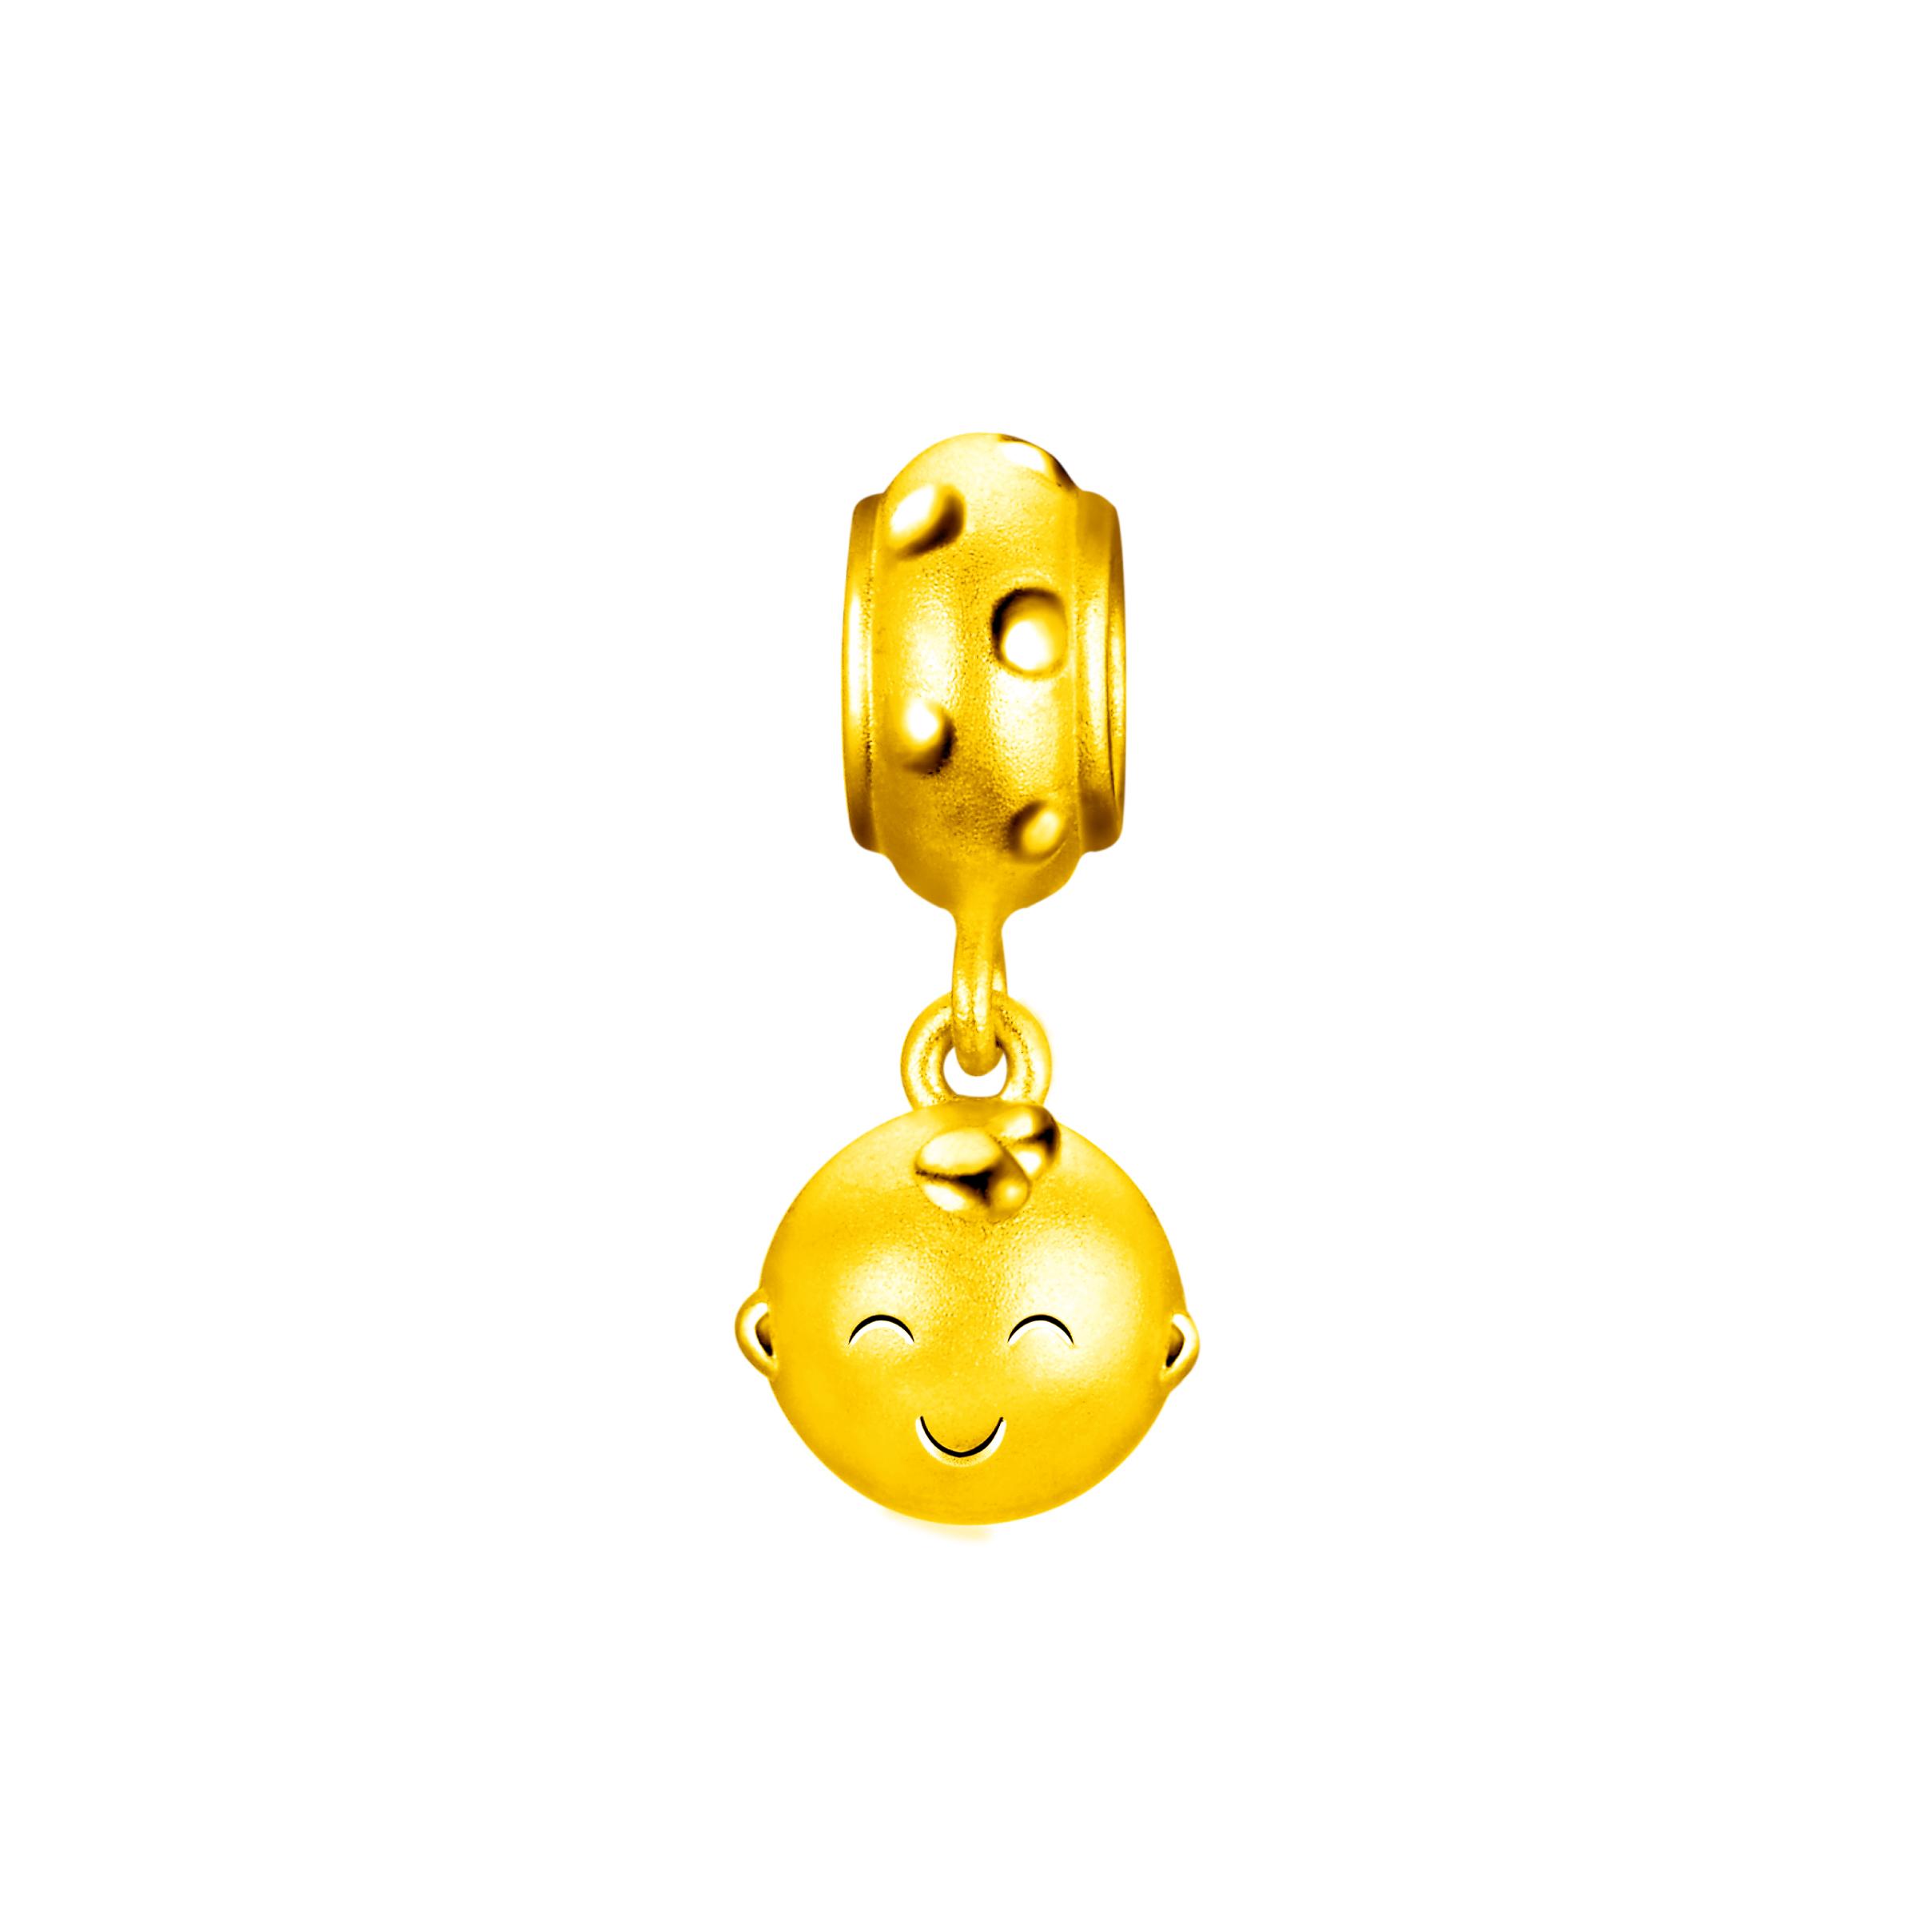 Hugging Family Ka-ka Three-dimensional Gold Bell